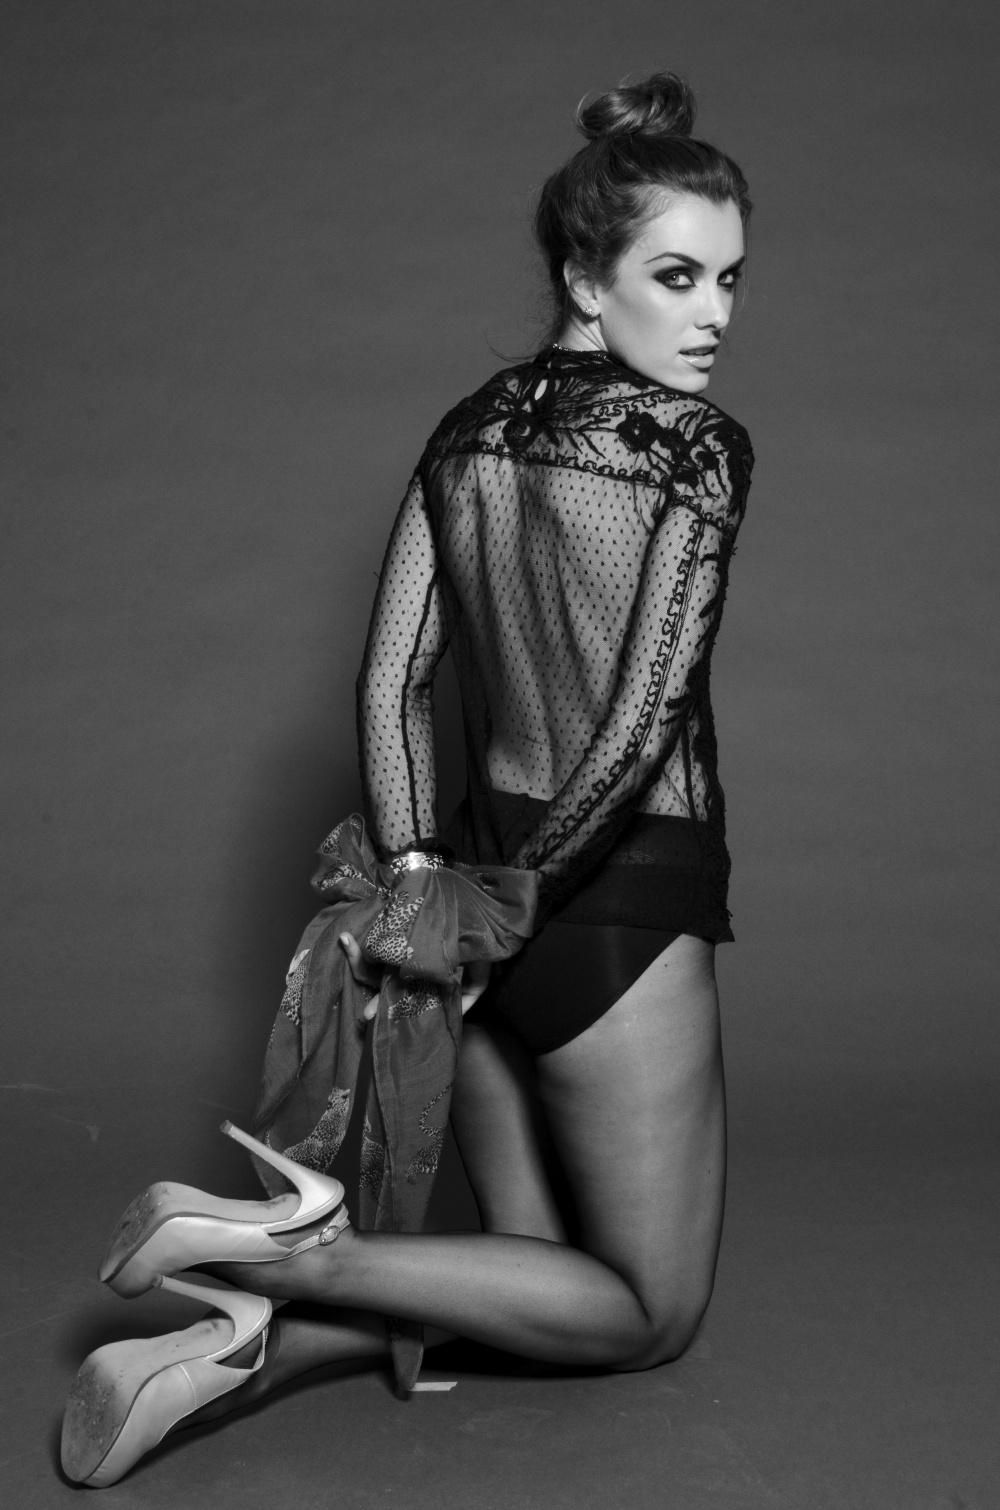 Shannon Cochran,Penelope Ann Miller Hot pics Frederikke Winther DEN,Genevieve (actress)